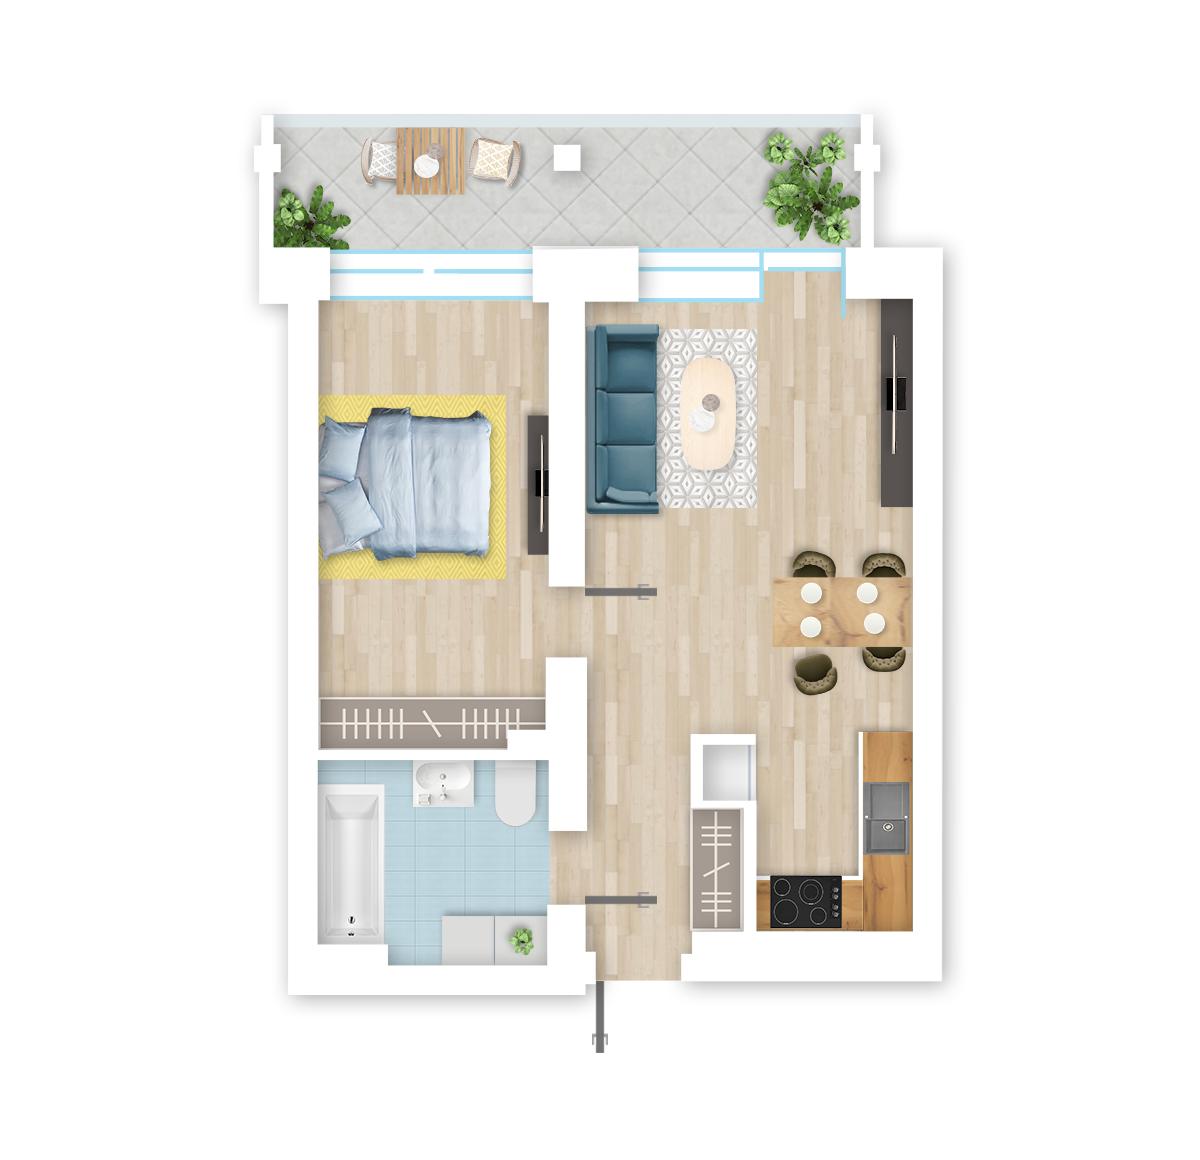 parduodamas butas Lietaus g. 4 - 31 Vilniuje, buto 3D vaizdas